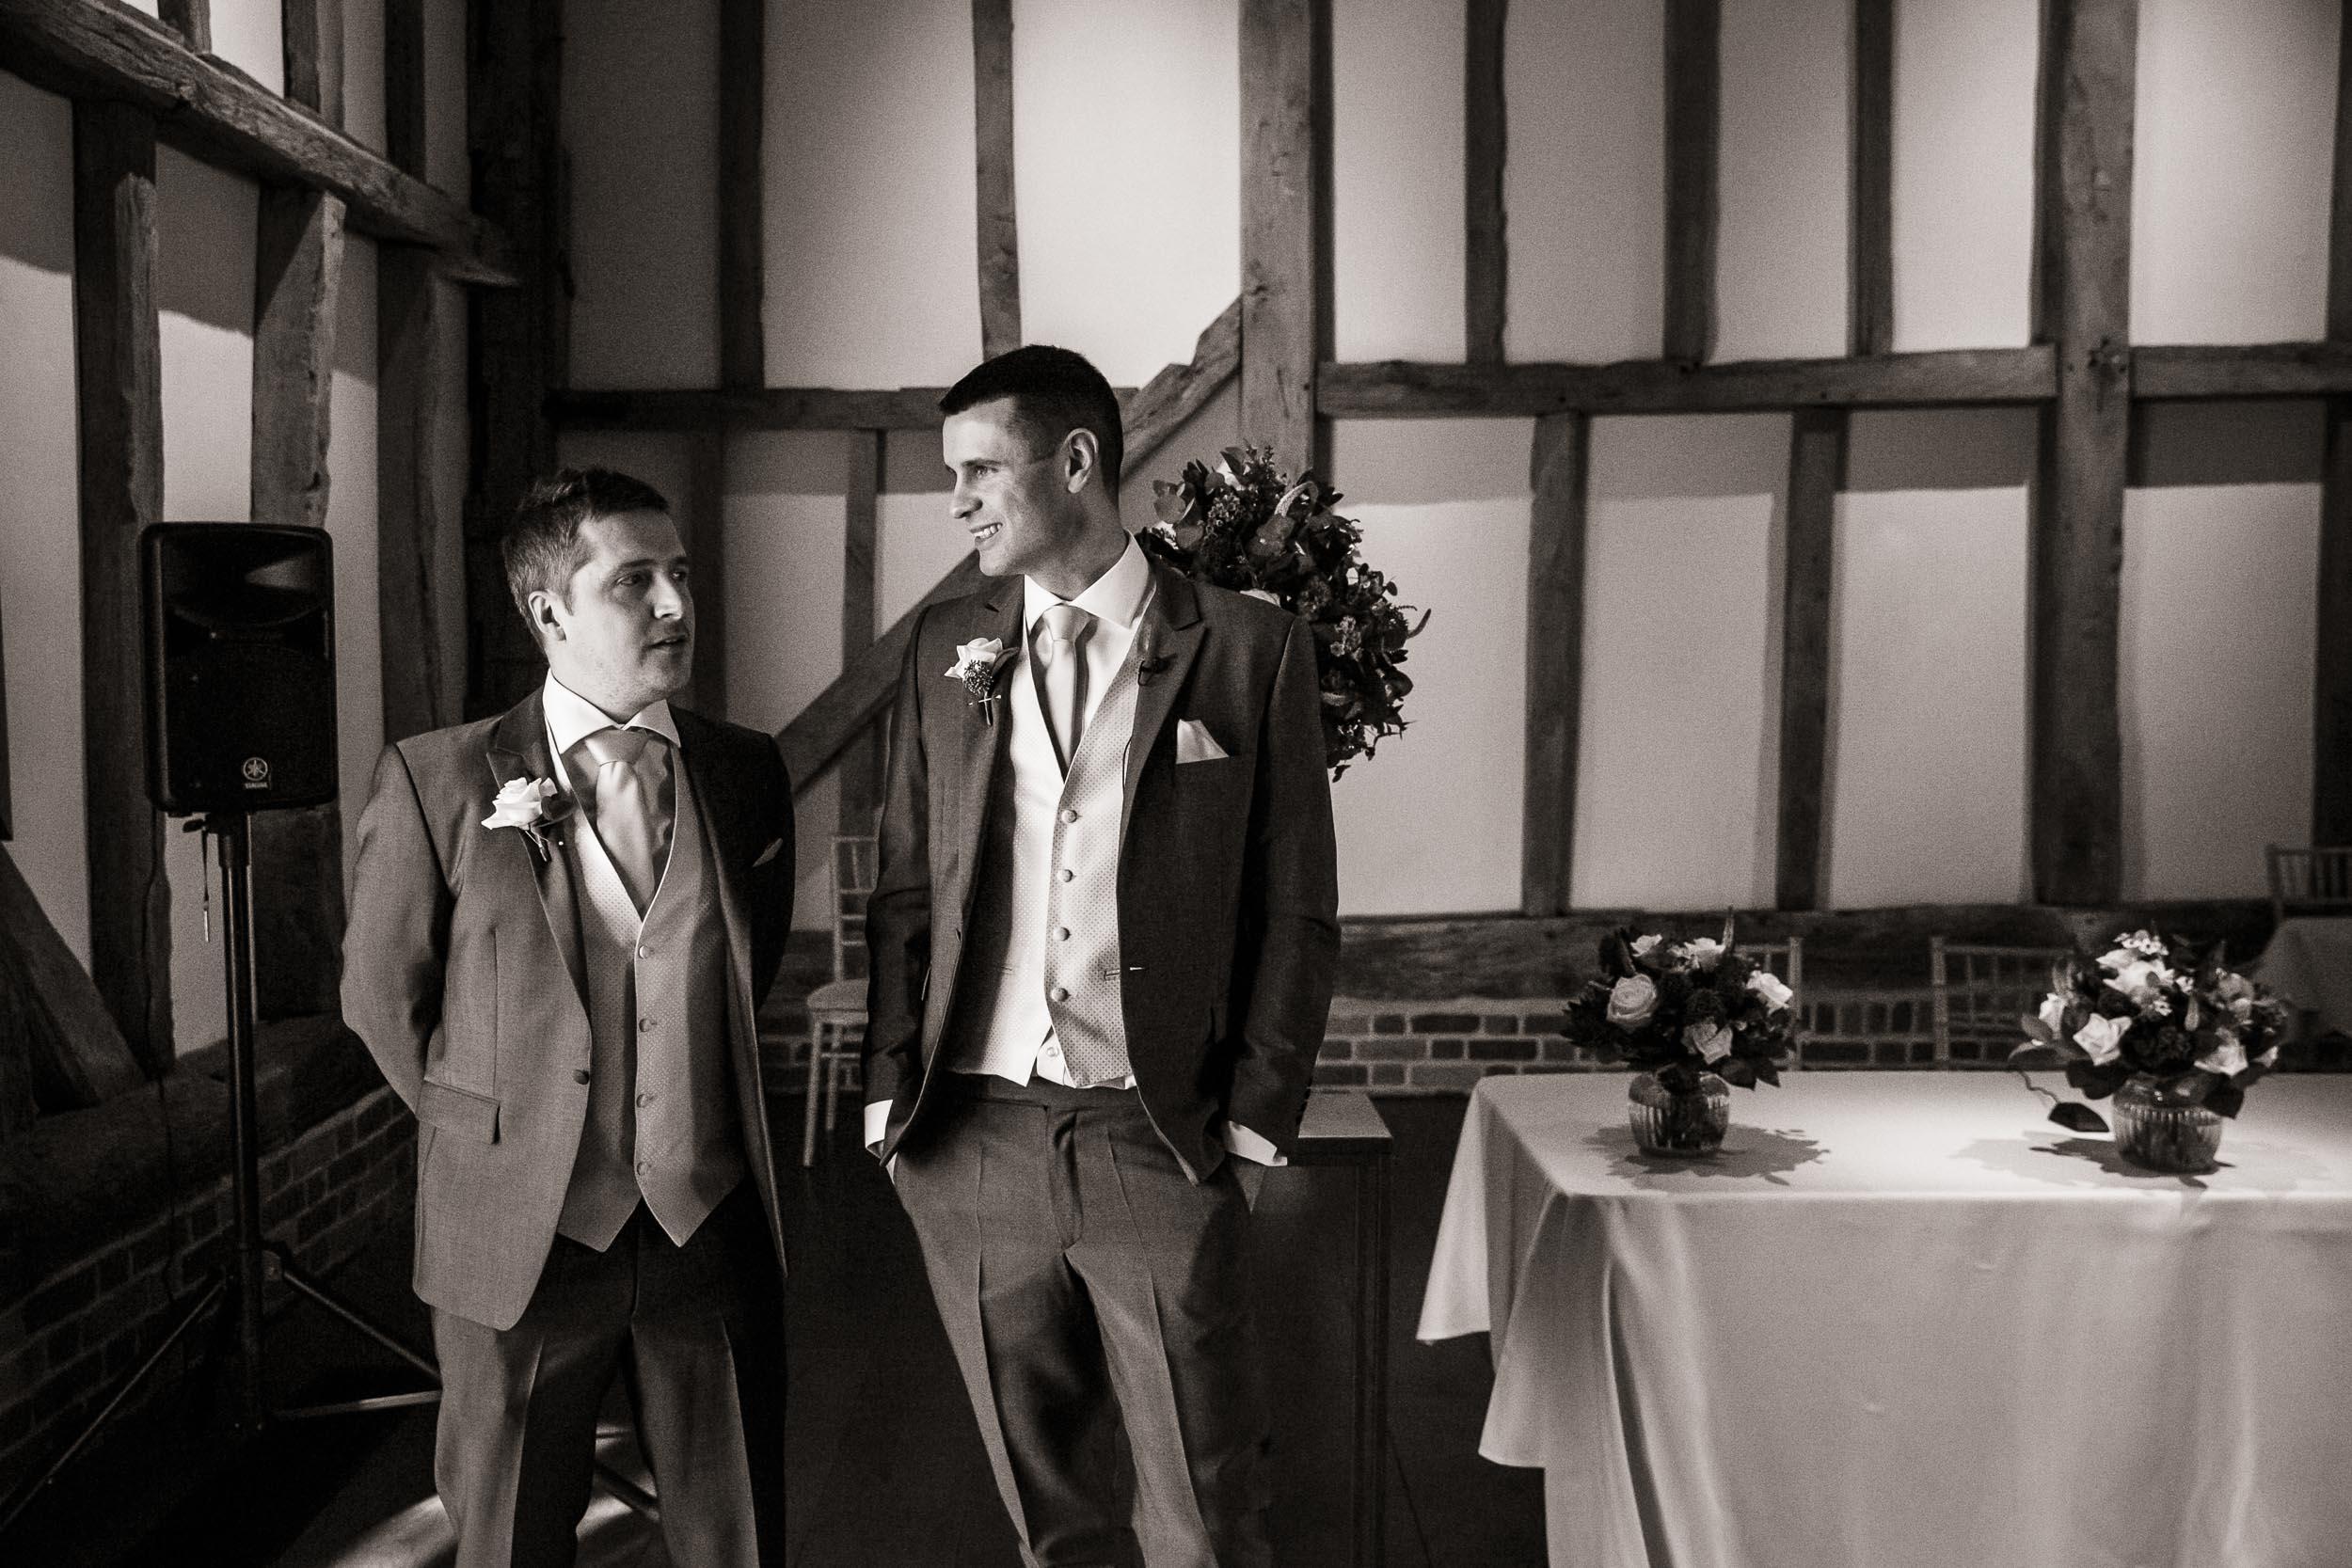 micklefield-hall-wedding-photographer 019.jpg